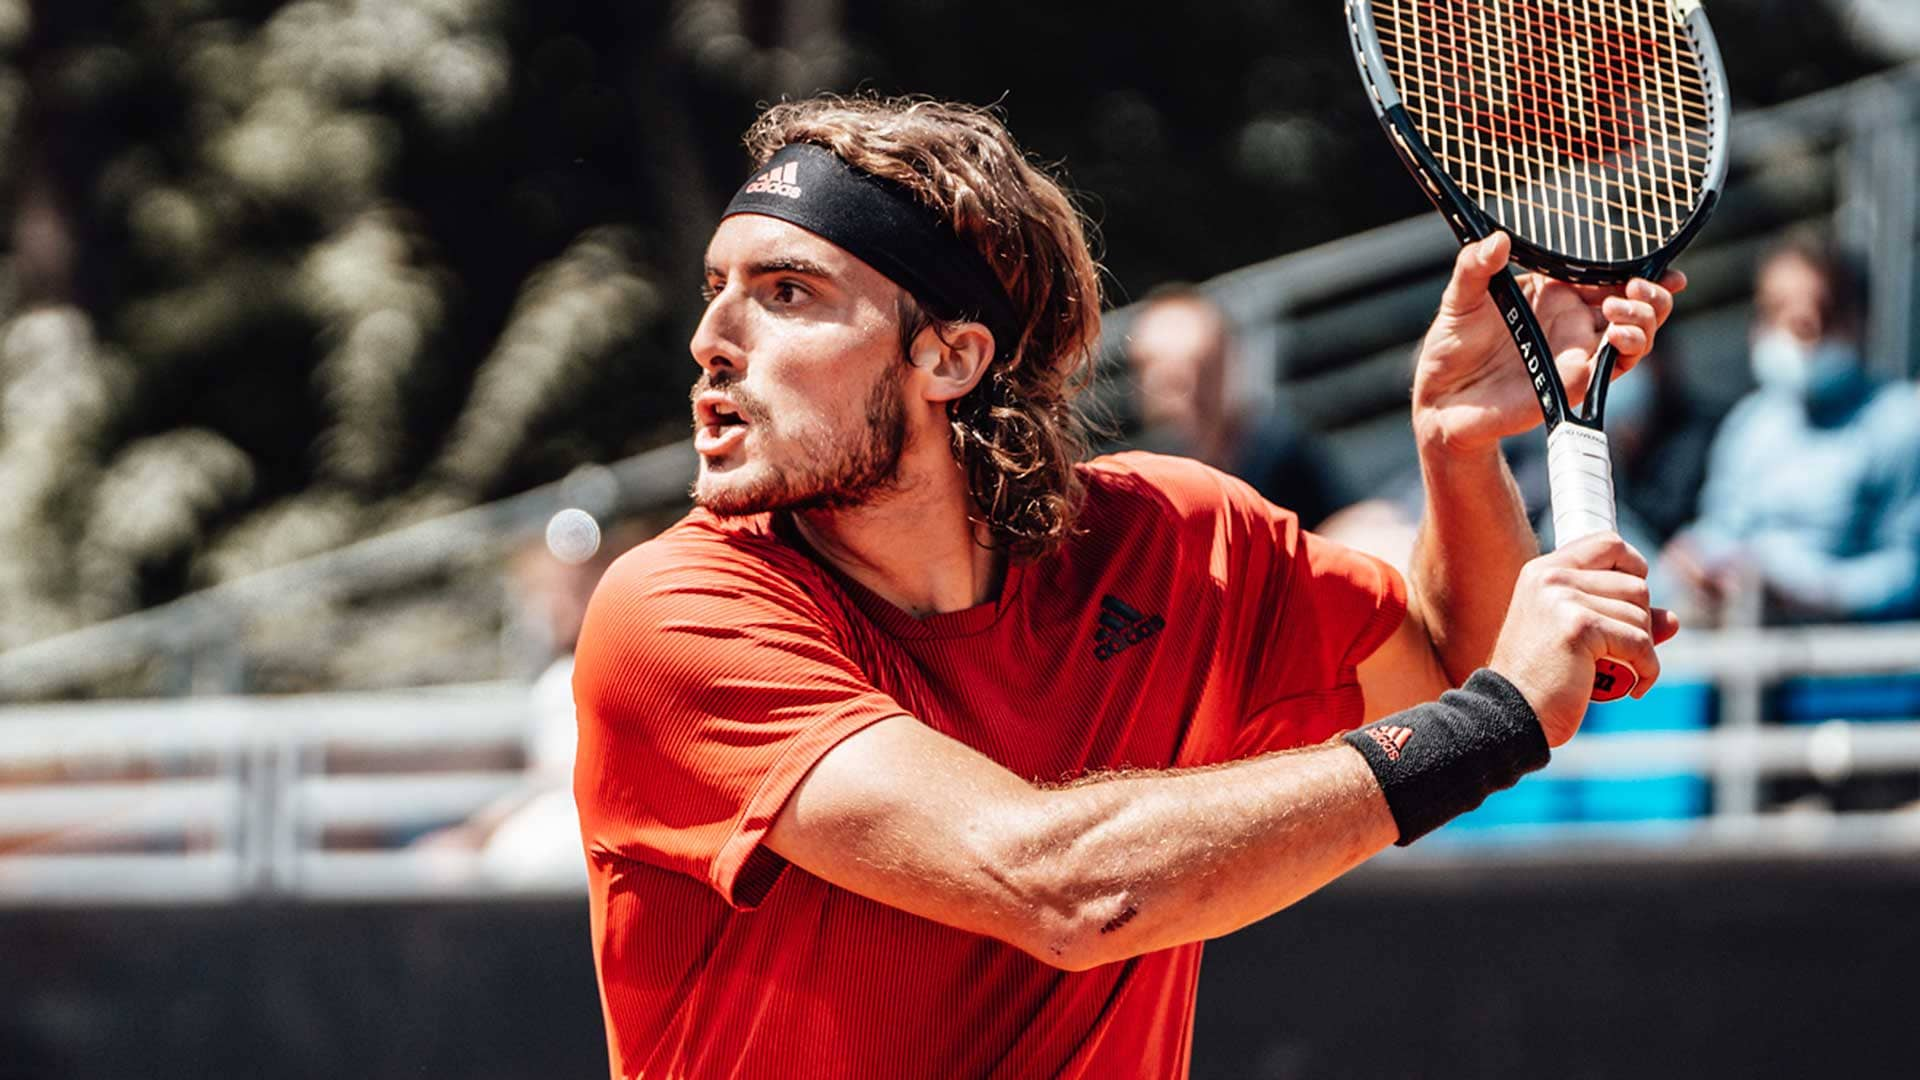 tsitsipas lyon 2021 saturday4 - ATP Lyon: V finalu se bosta jutri pomerila Tsitsipas in Norrie